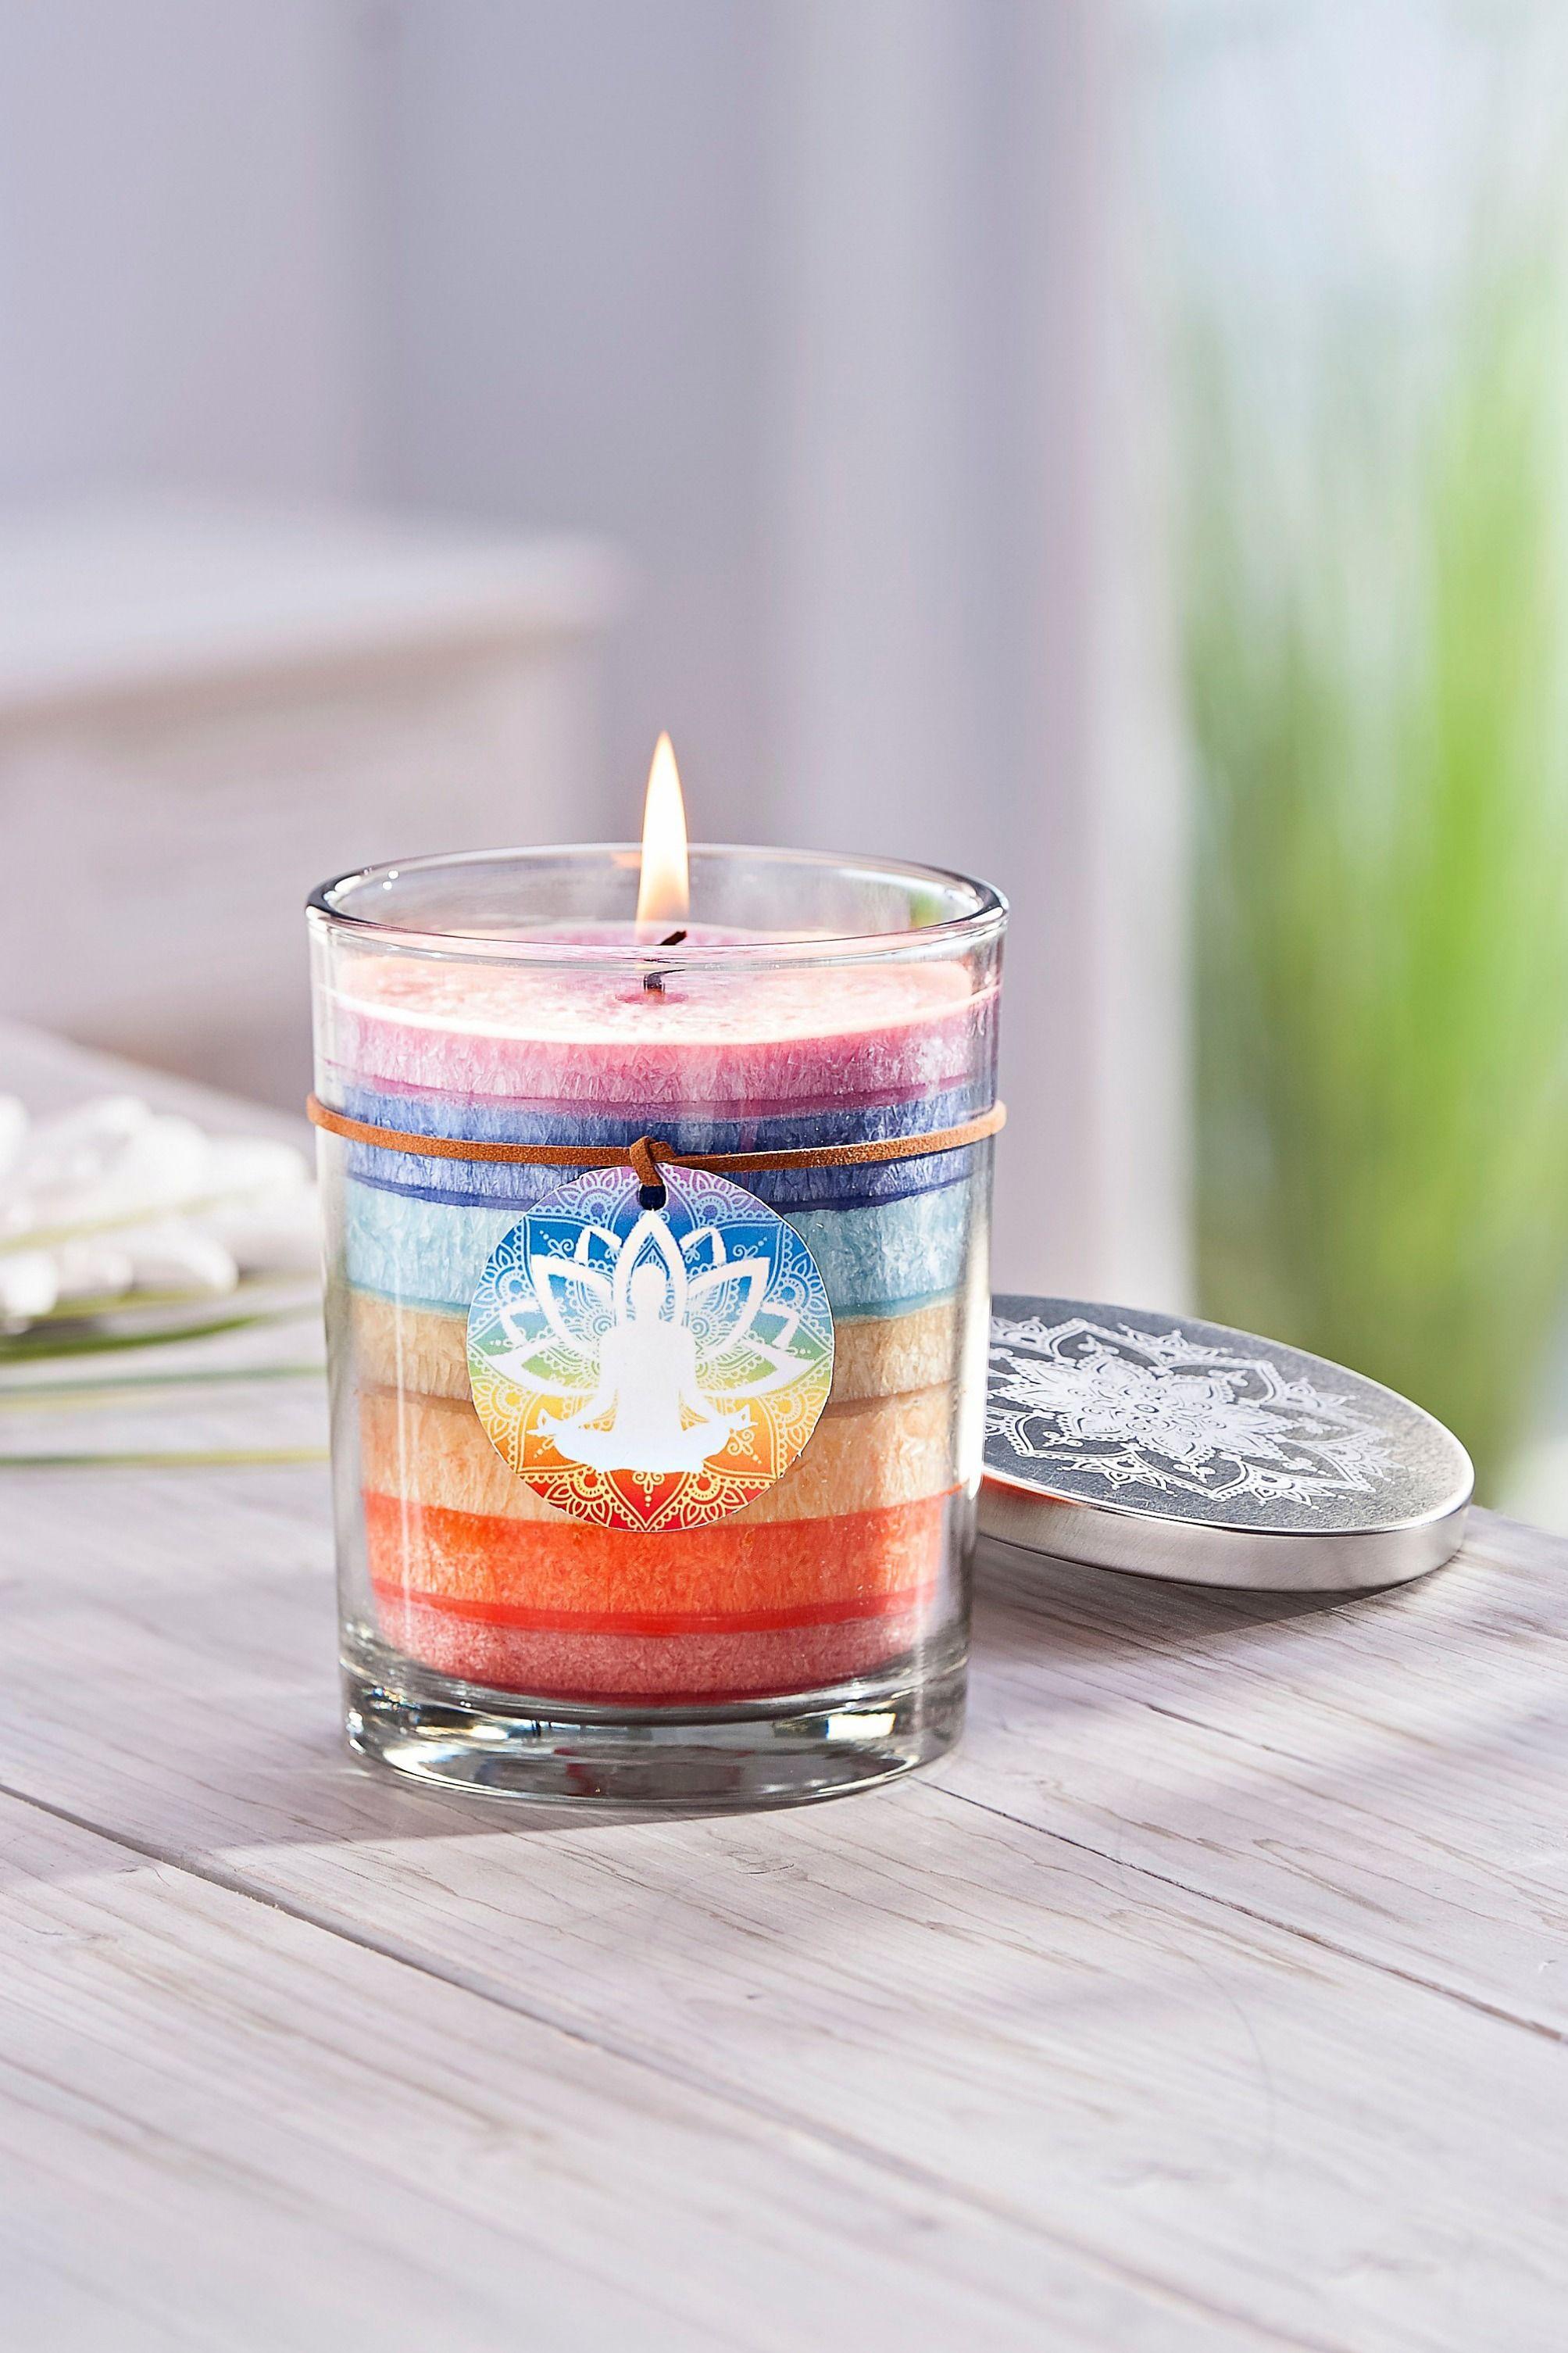 Xl Kerze Chakra Im Glas Jetzt Bei Weltbild De Bestellen Kerzen